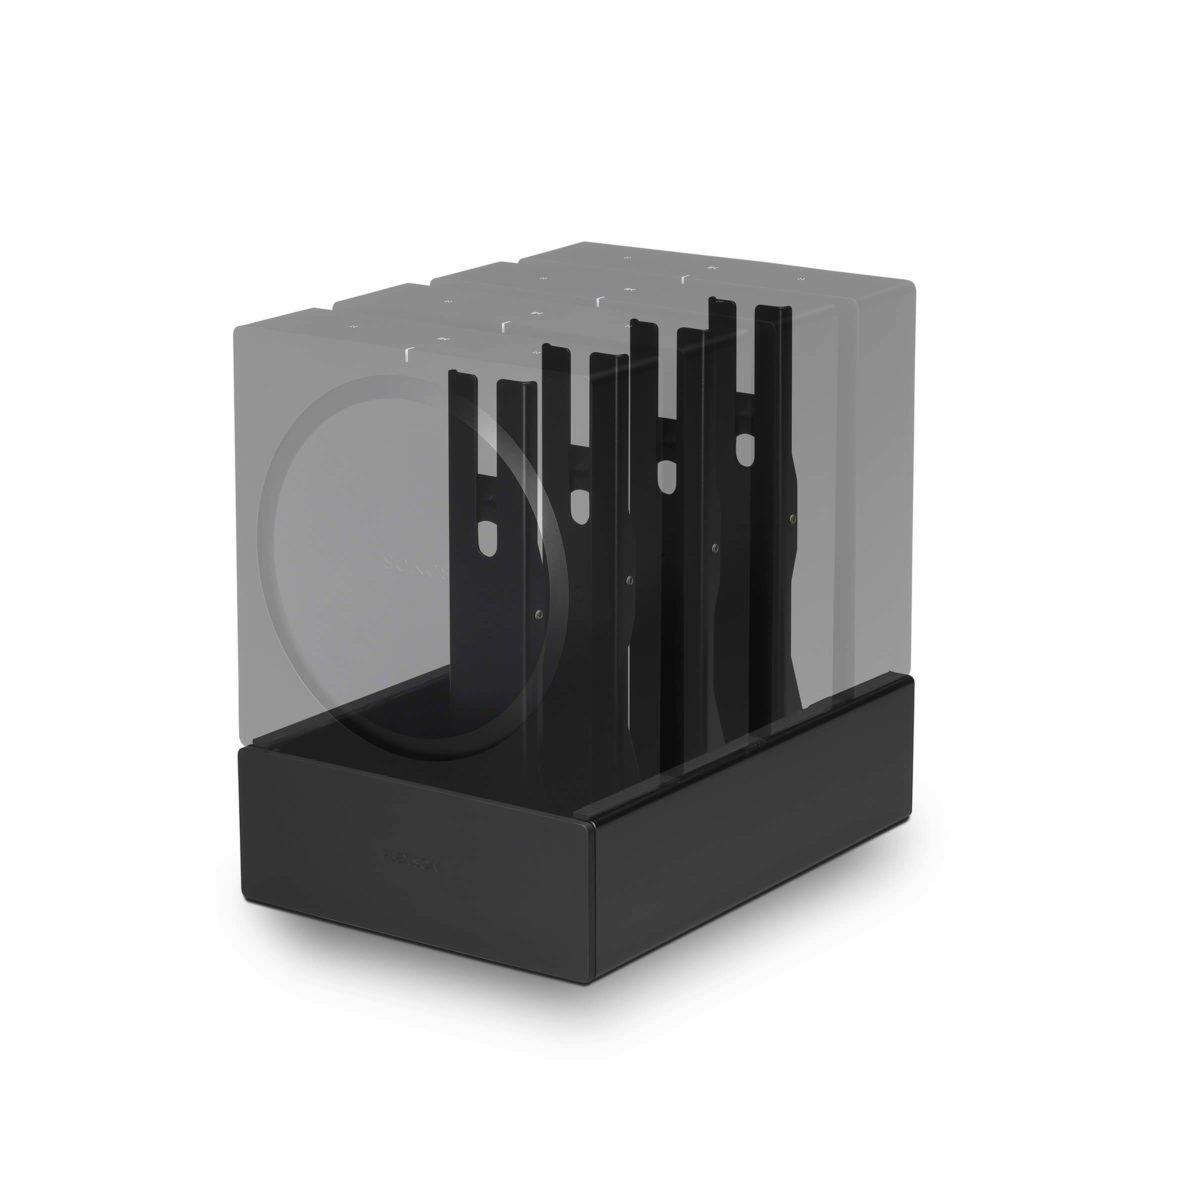 Flexson Sonos AMP dock 7